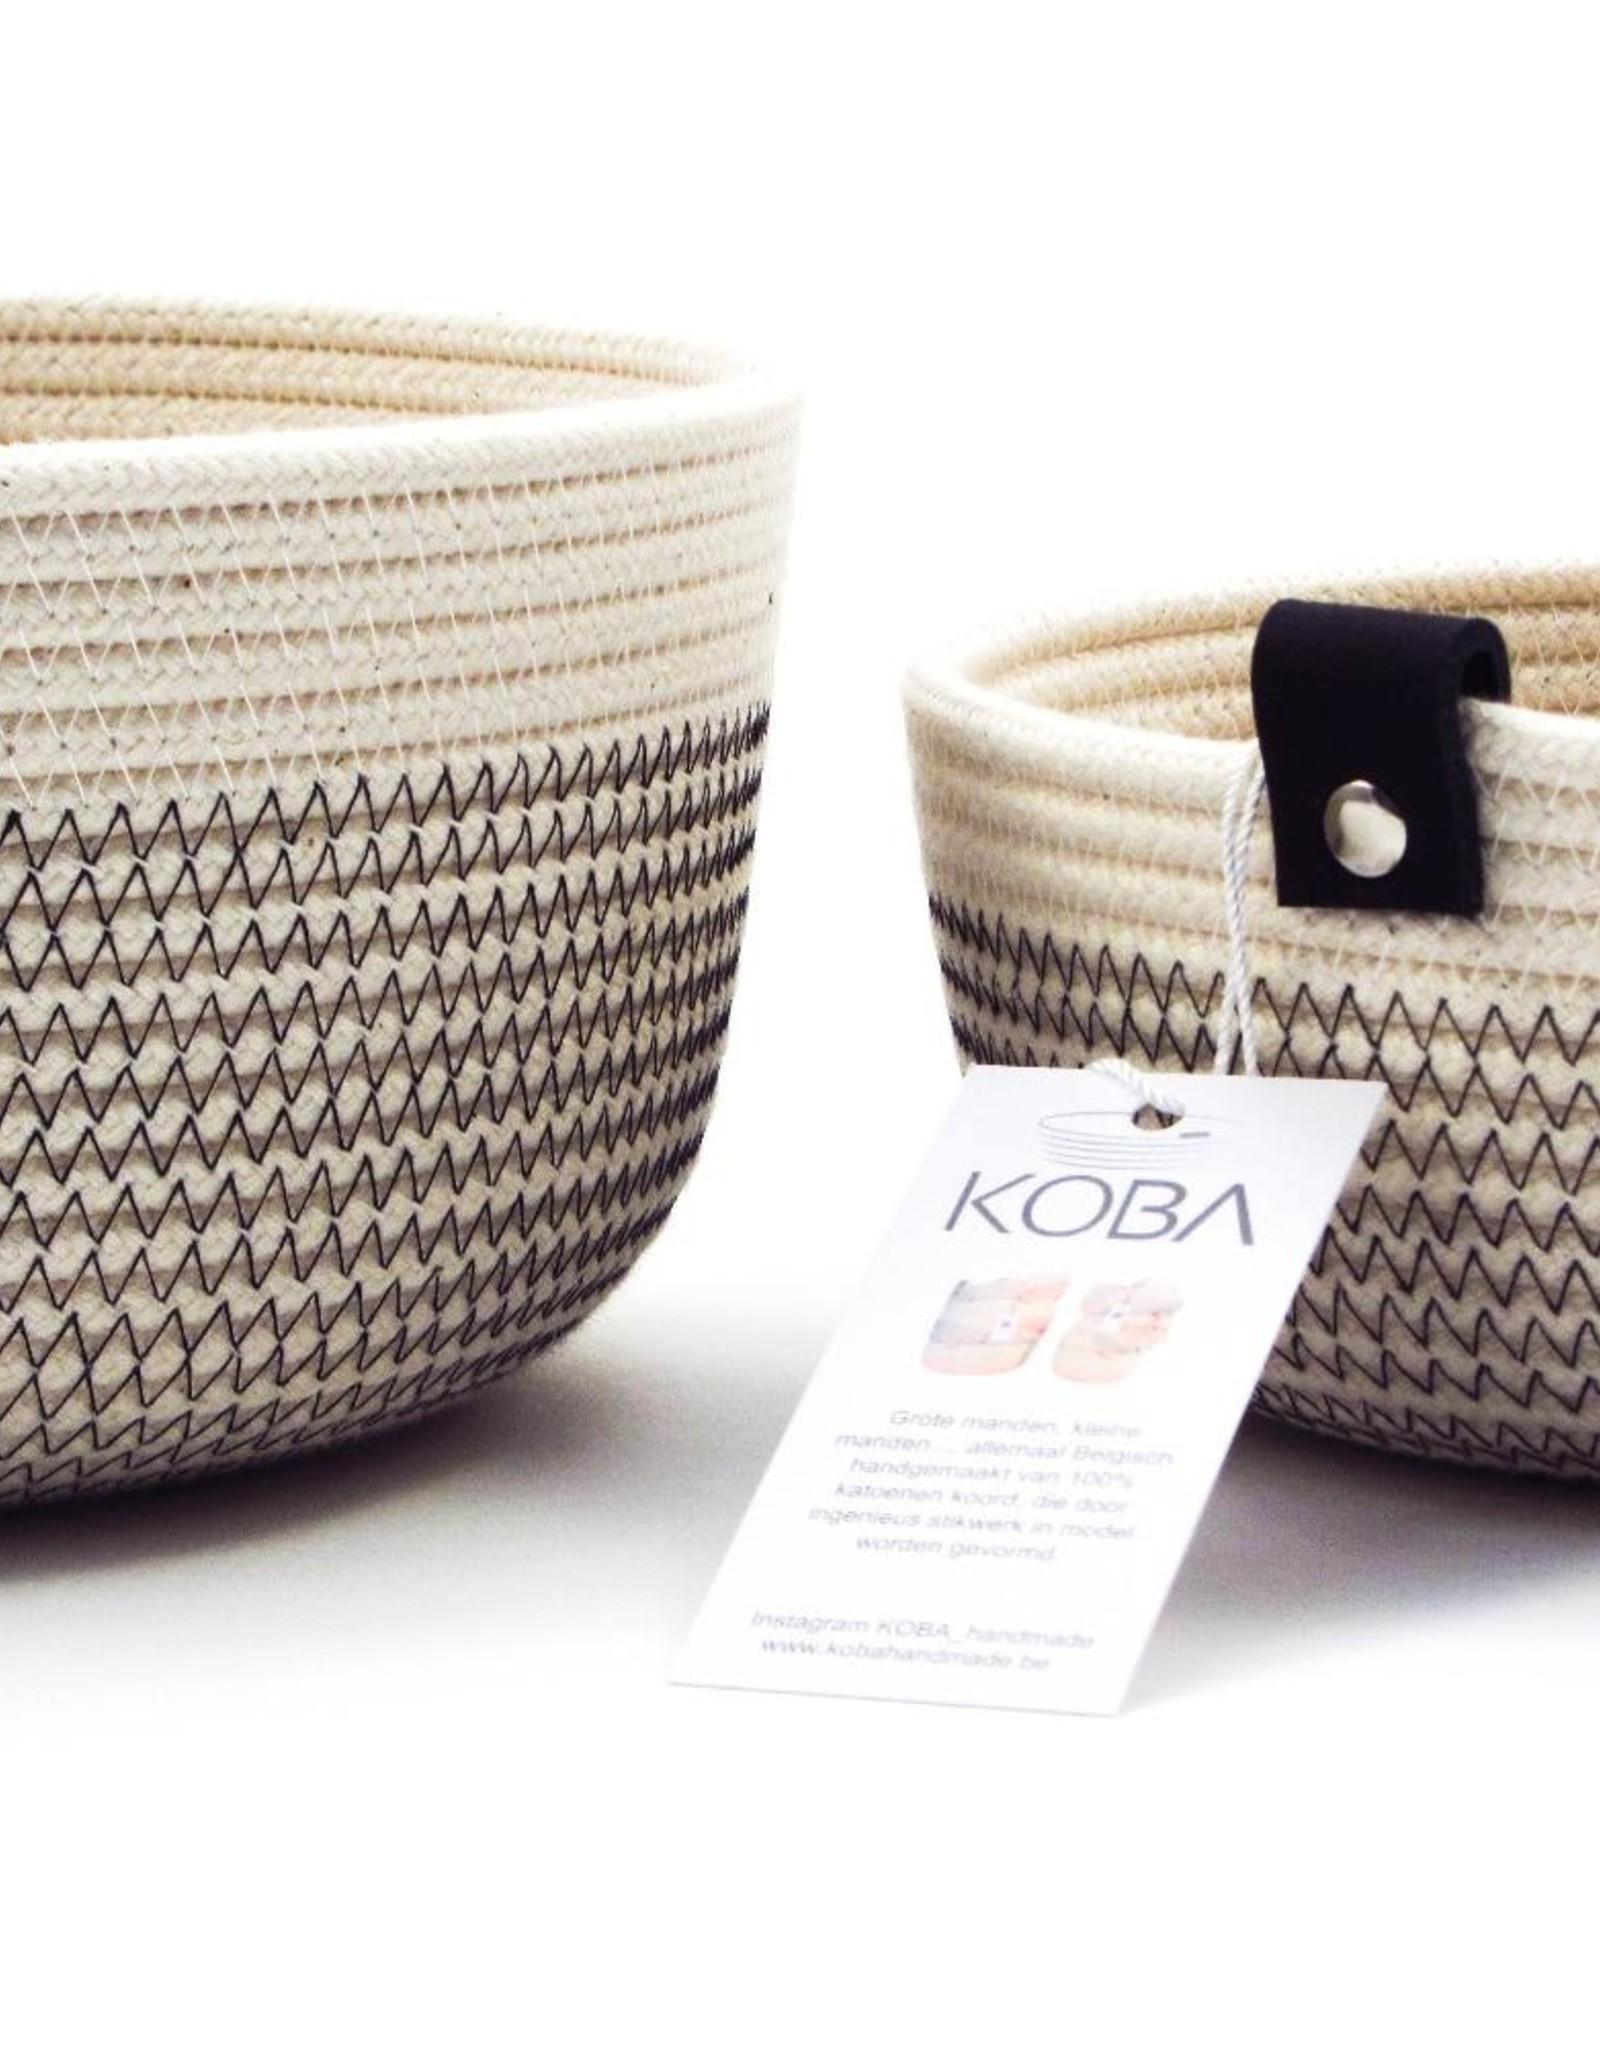 Koba Handmade Bowl Small Low-ecru/black 18x7cm